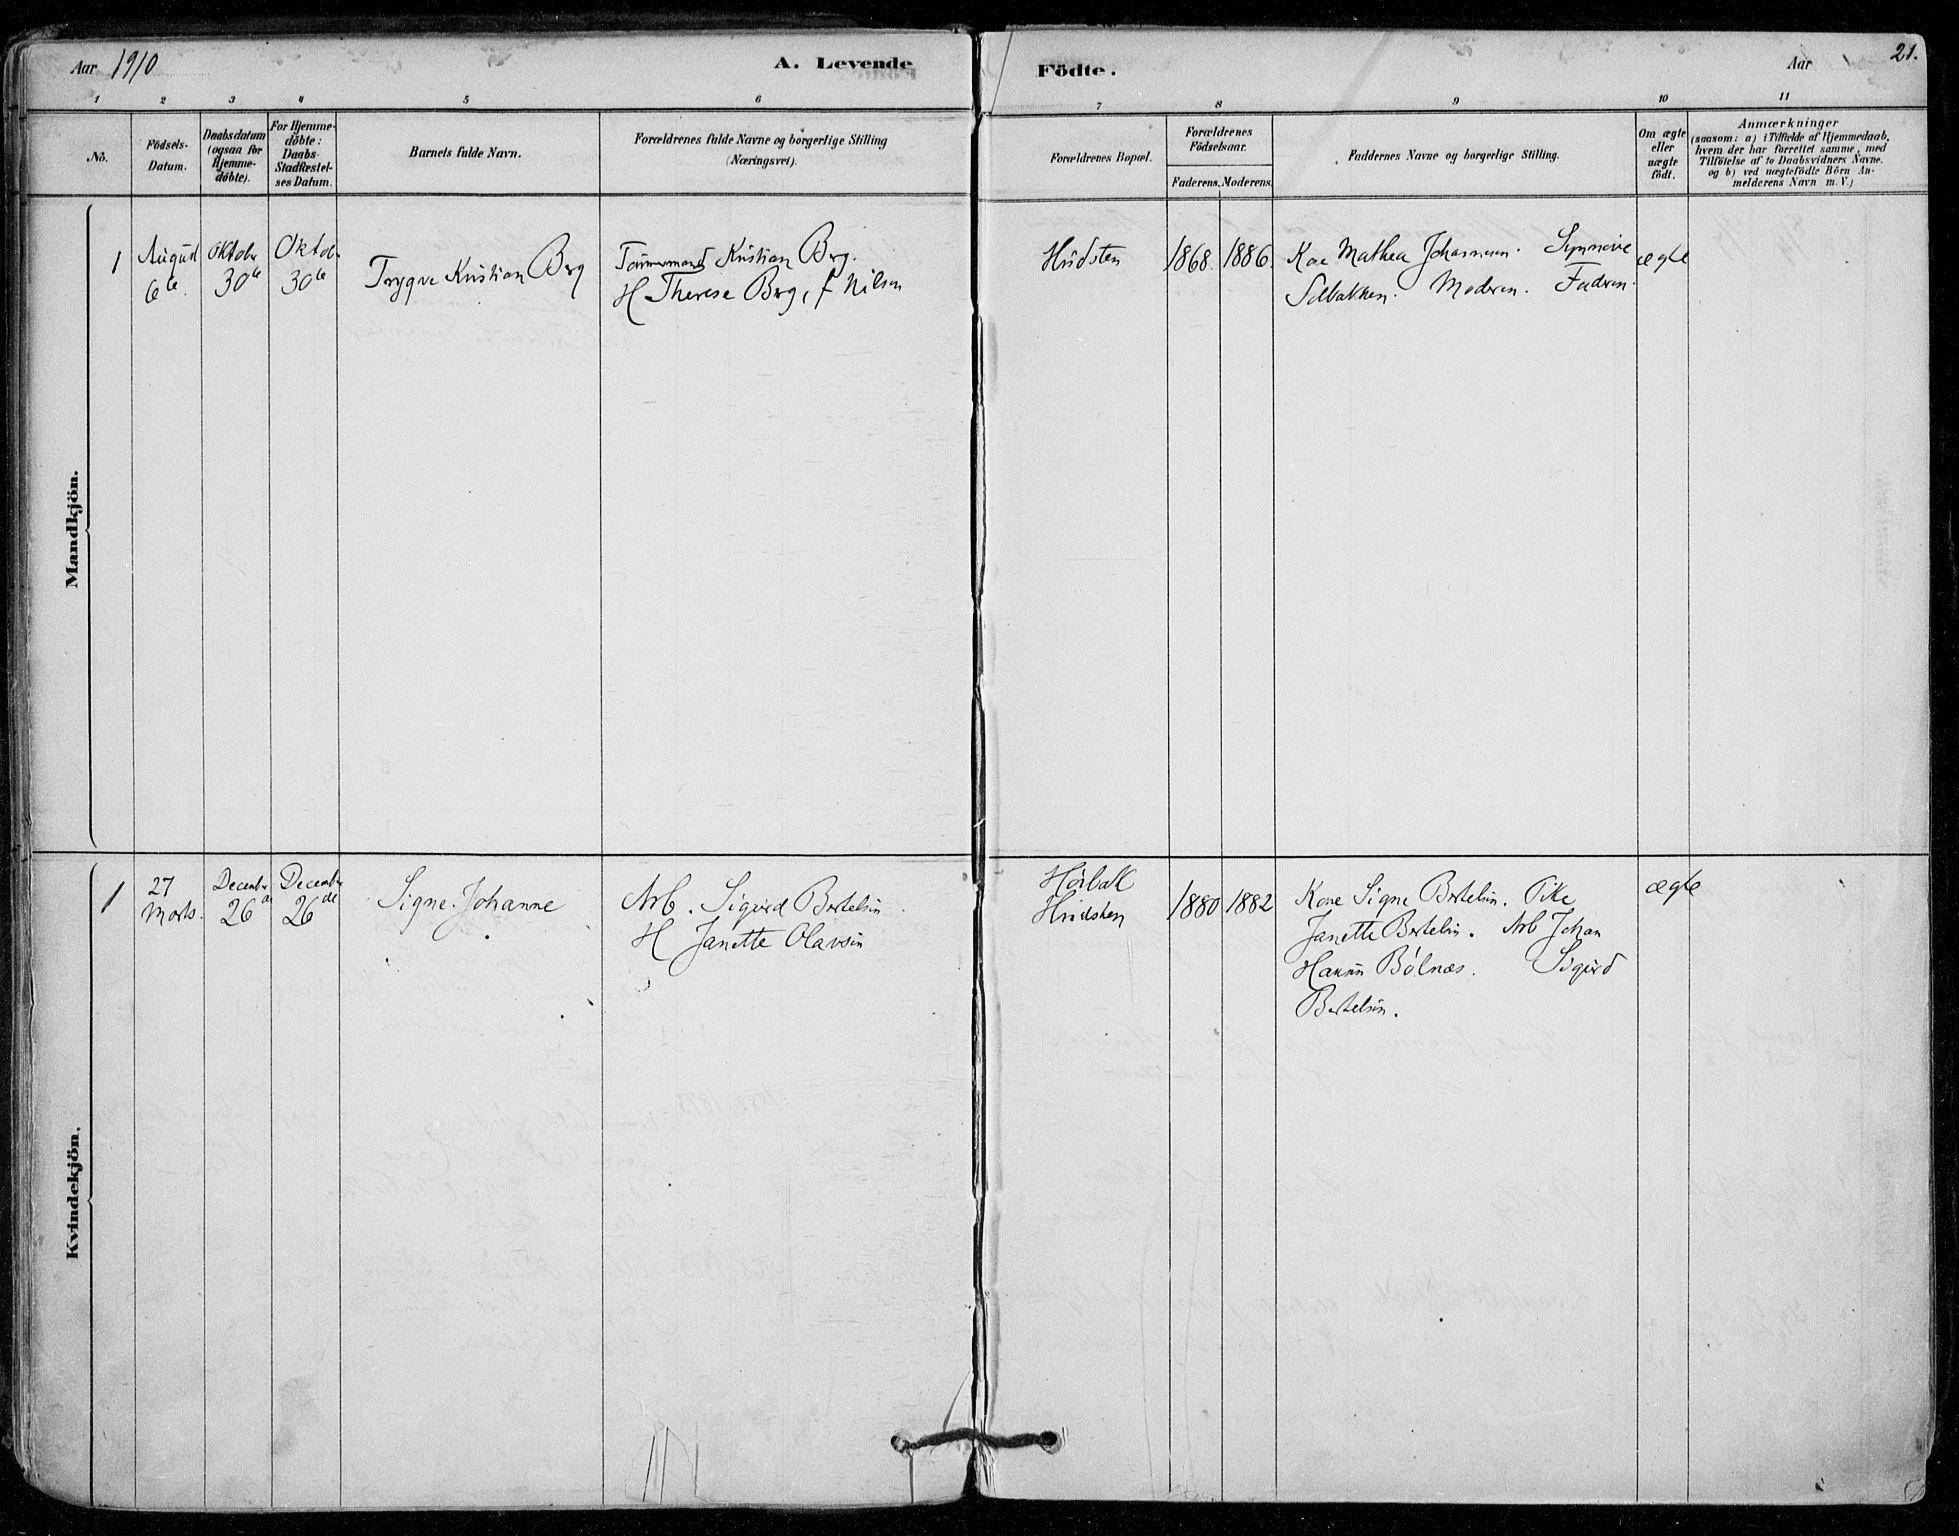 SAO, Vestby prestekontor Kirkebøker, F/Fd/L0001: Ministerialbok nr. IV 1, 1878-1945, s. 21